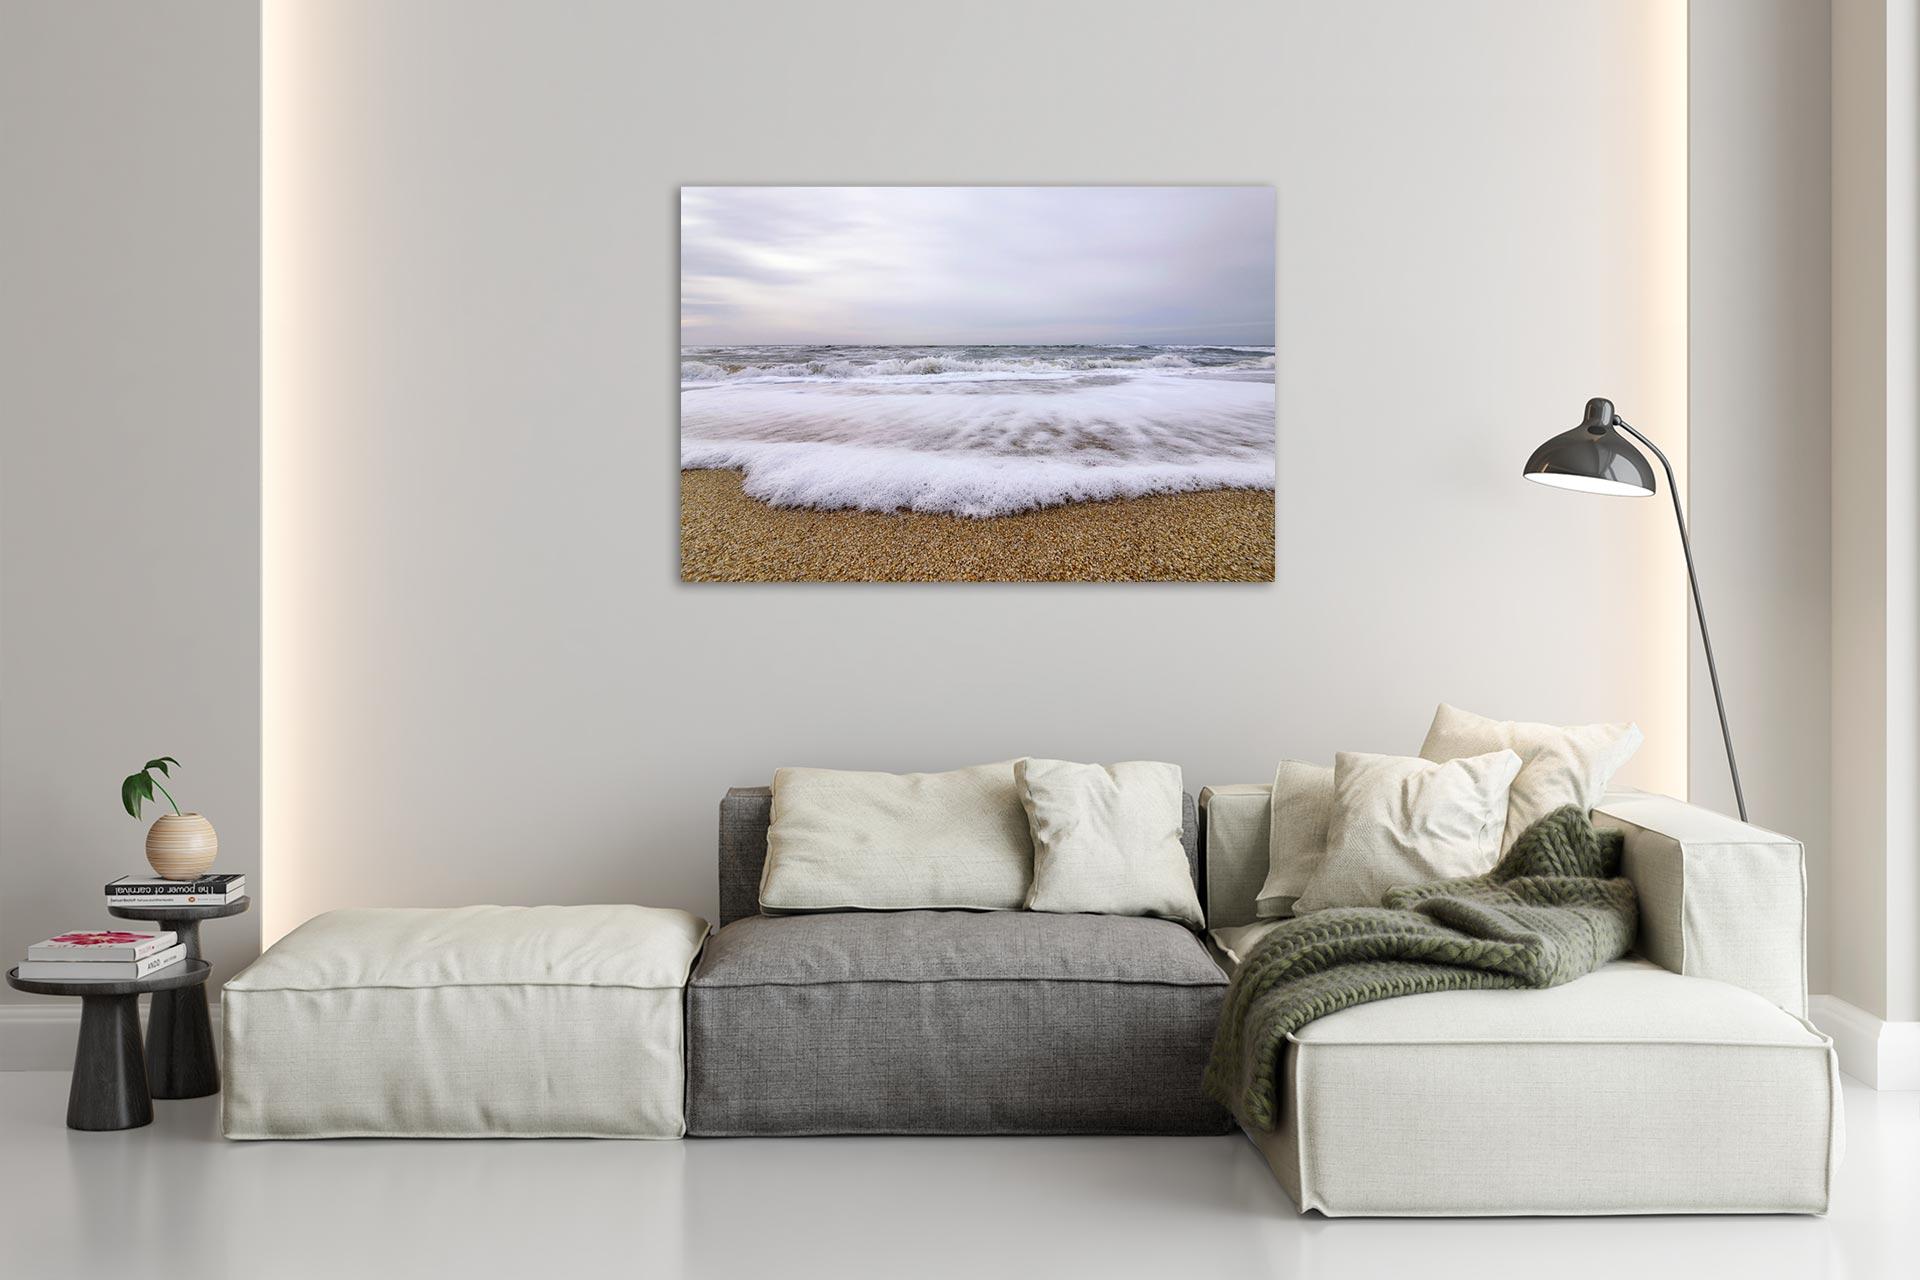 TG470-sylt-welle-wandbild-bild-auf-leinwand-acrylglas-aludibond-wohnzimmer